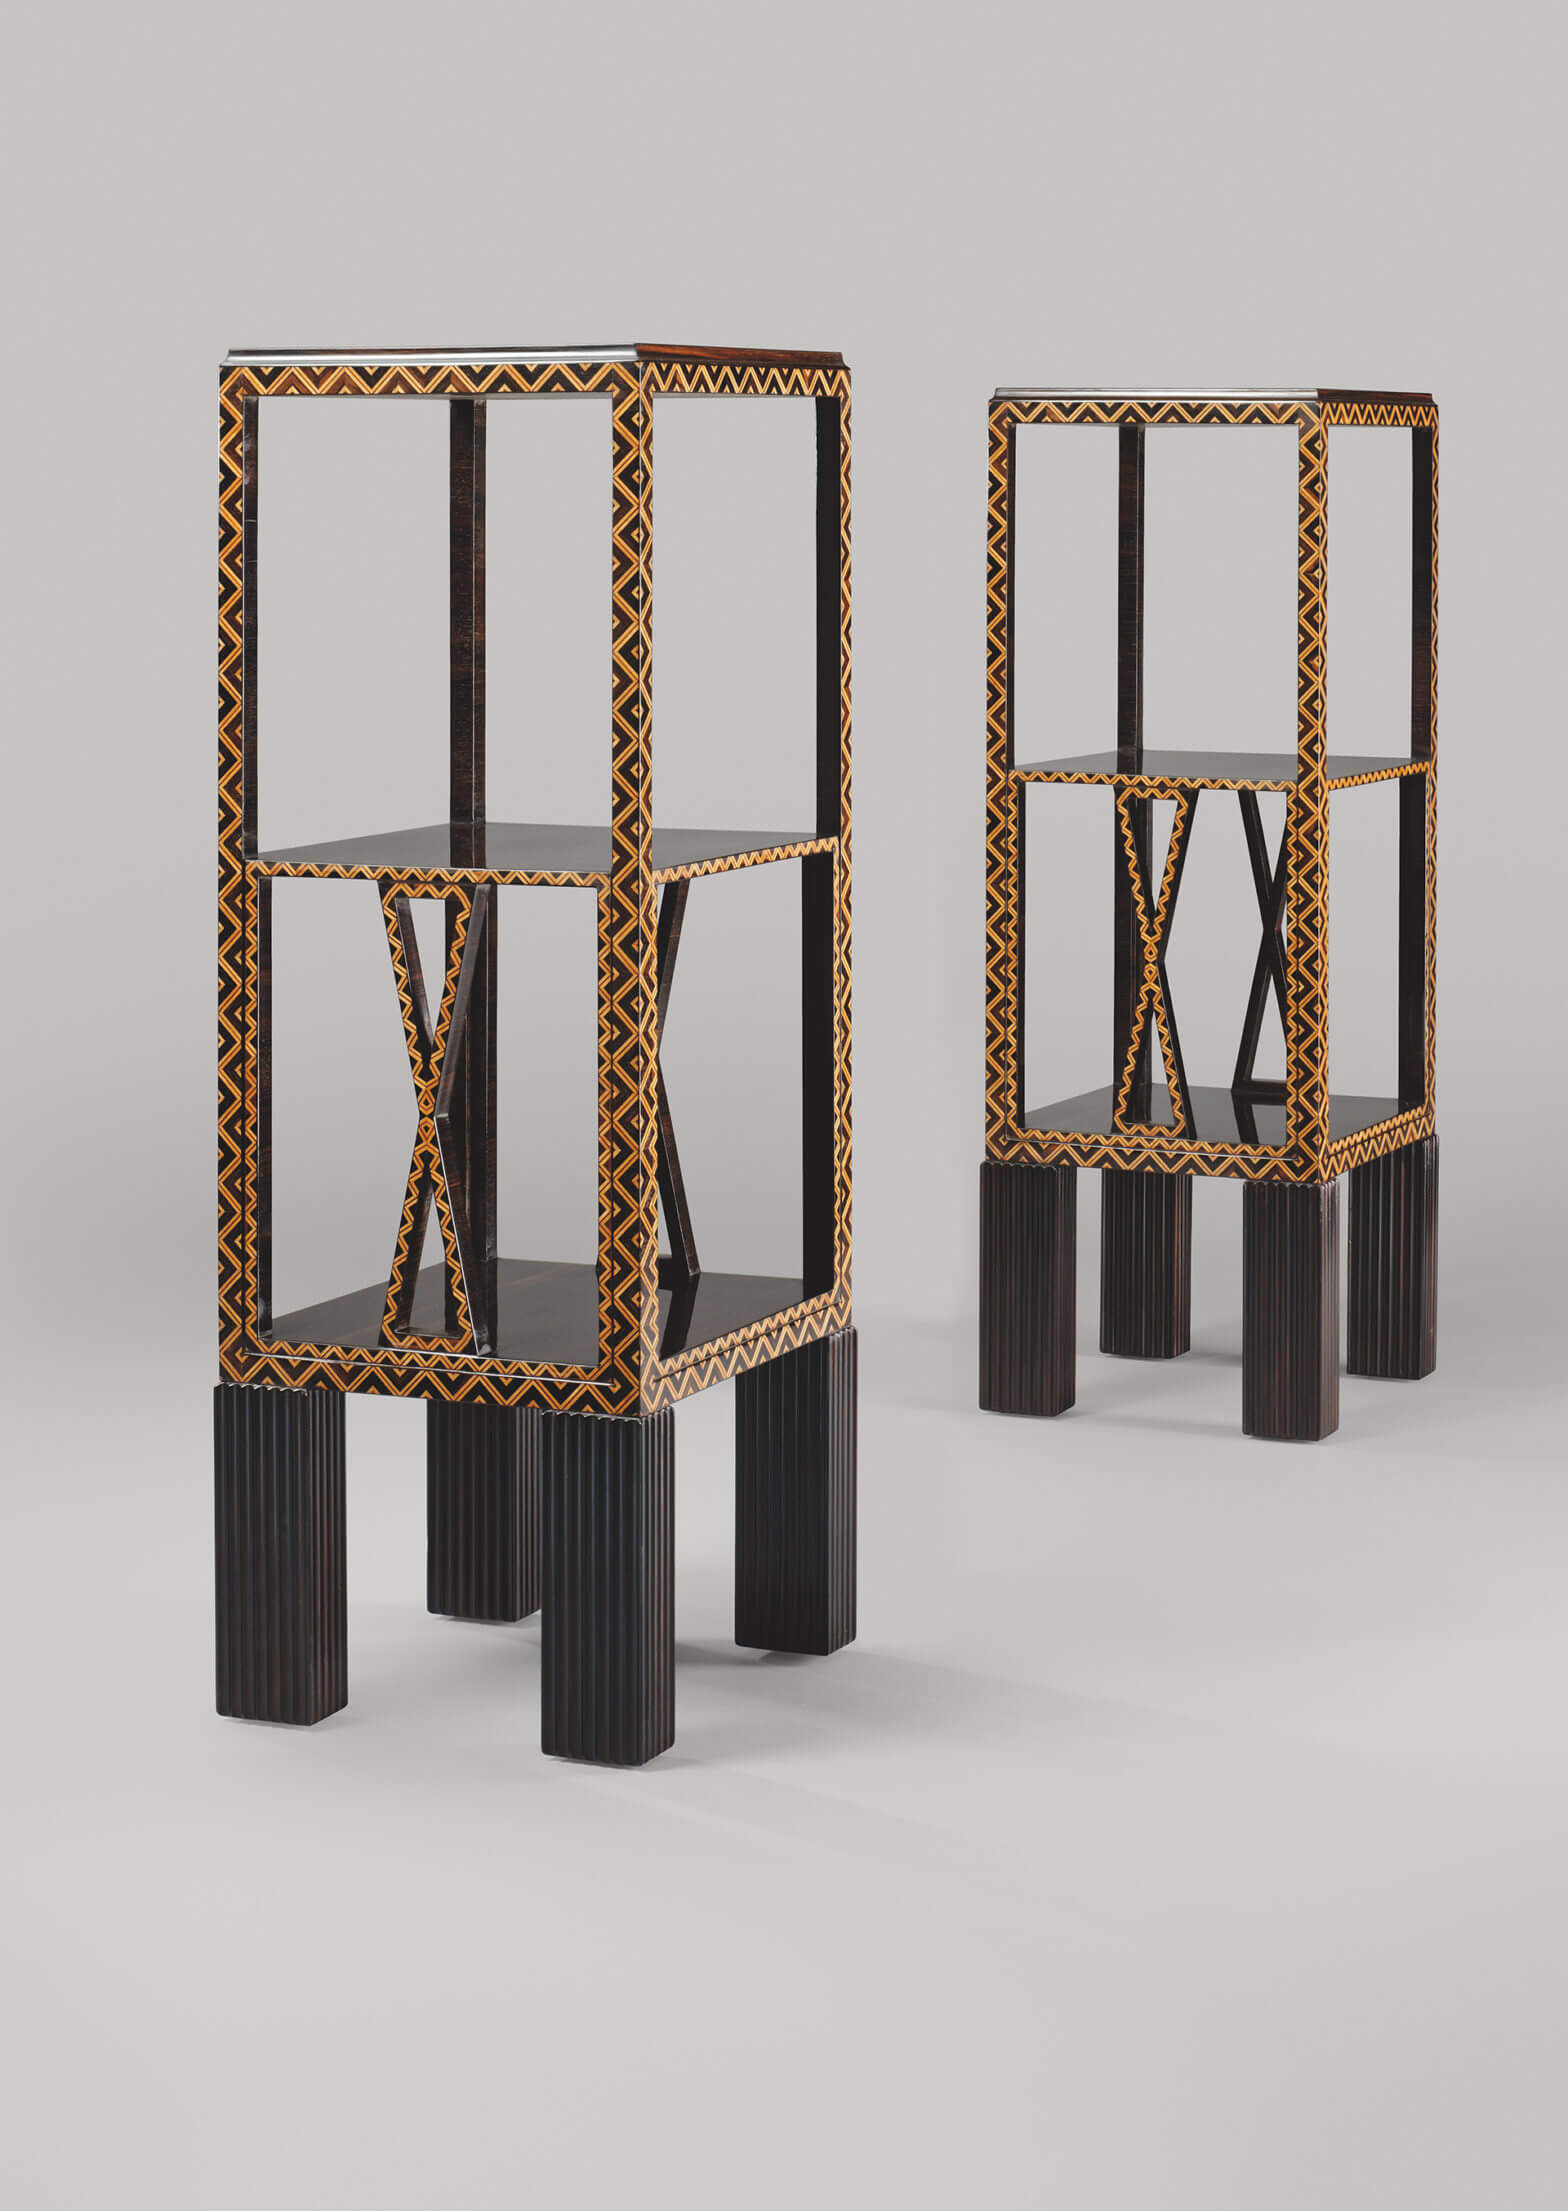 Josef Hoffman - Etageres for the Villa Ast, Vienna, MAK, Neue Galerie, New-York